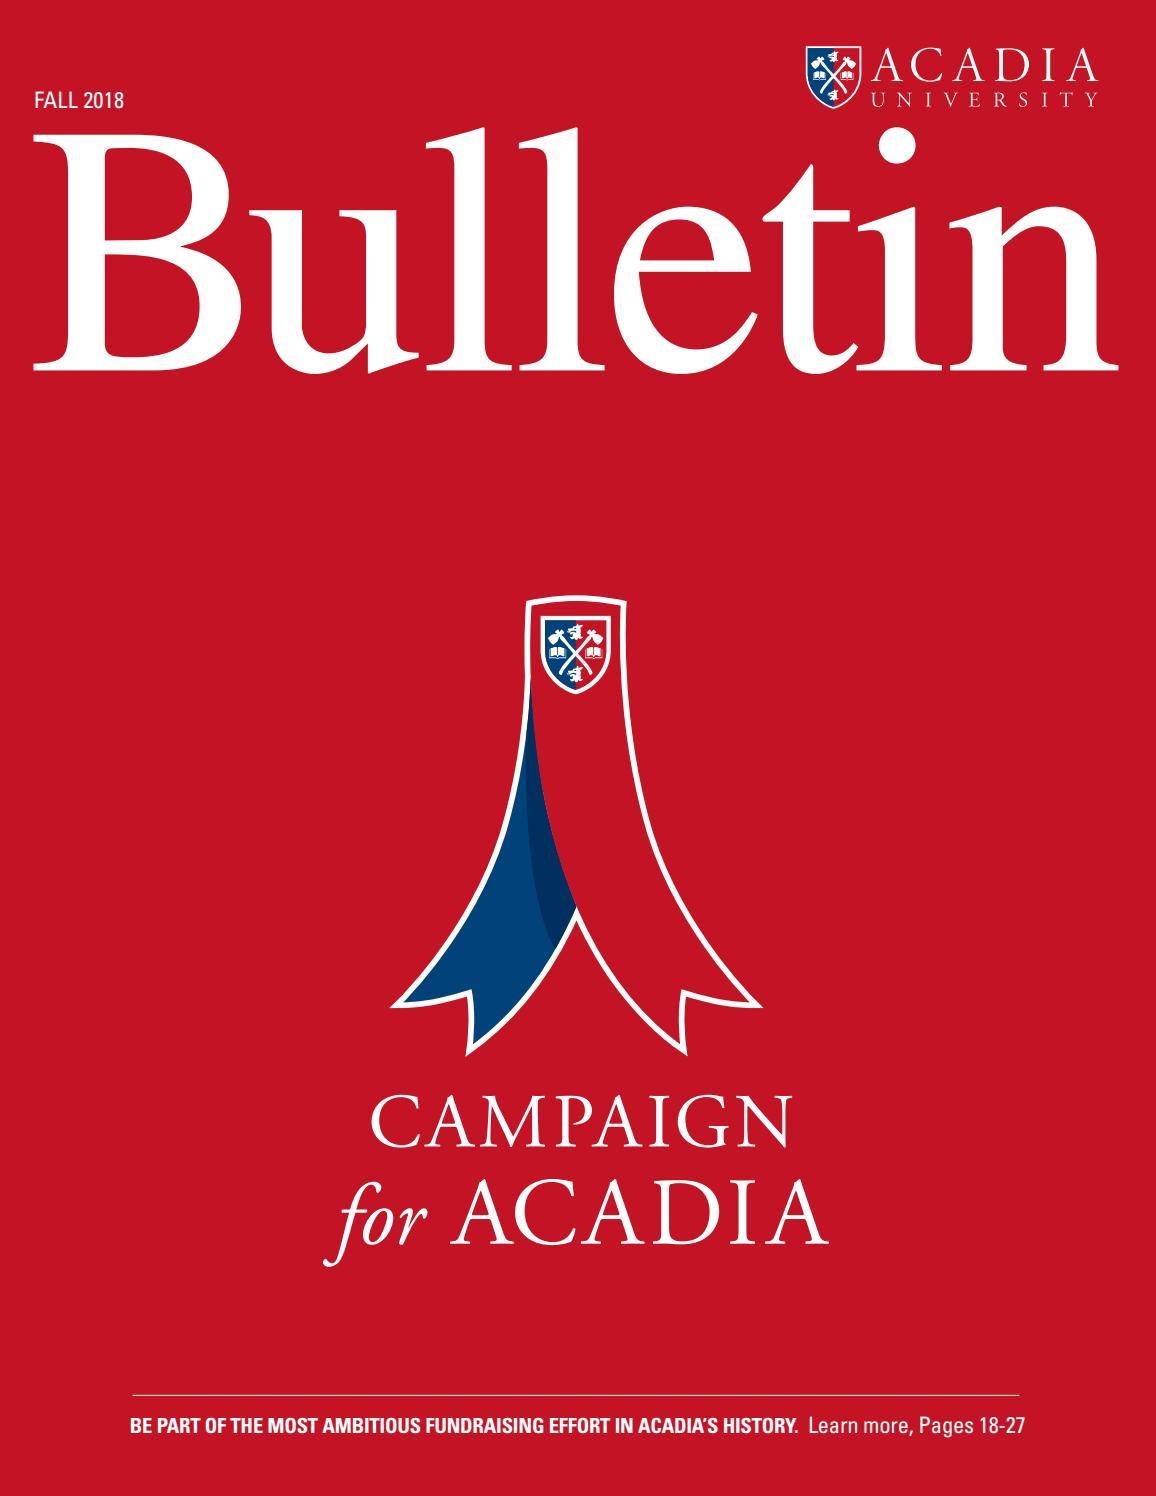 Acadia Bulletin - Fall 2018 by Acadia Advancement - issuu